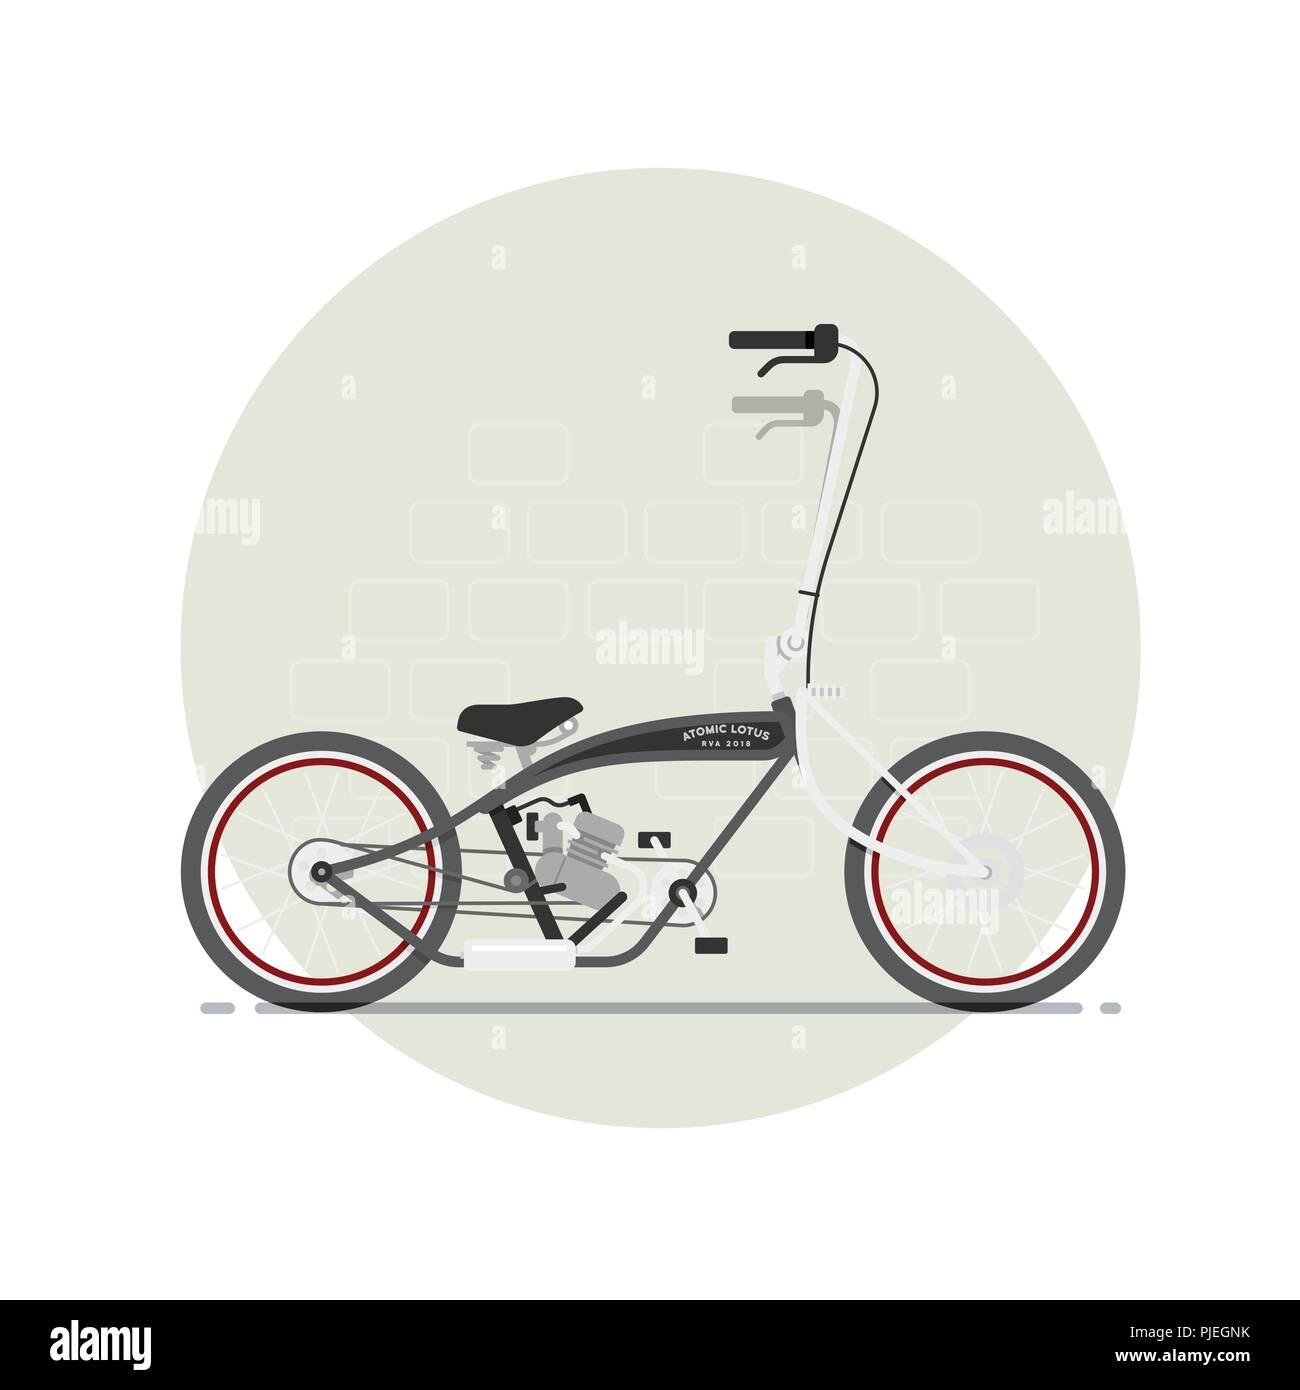 Bicycle with ape hanger handlebars - Stock Image